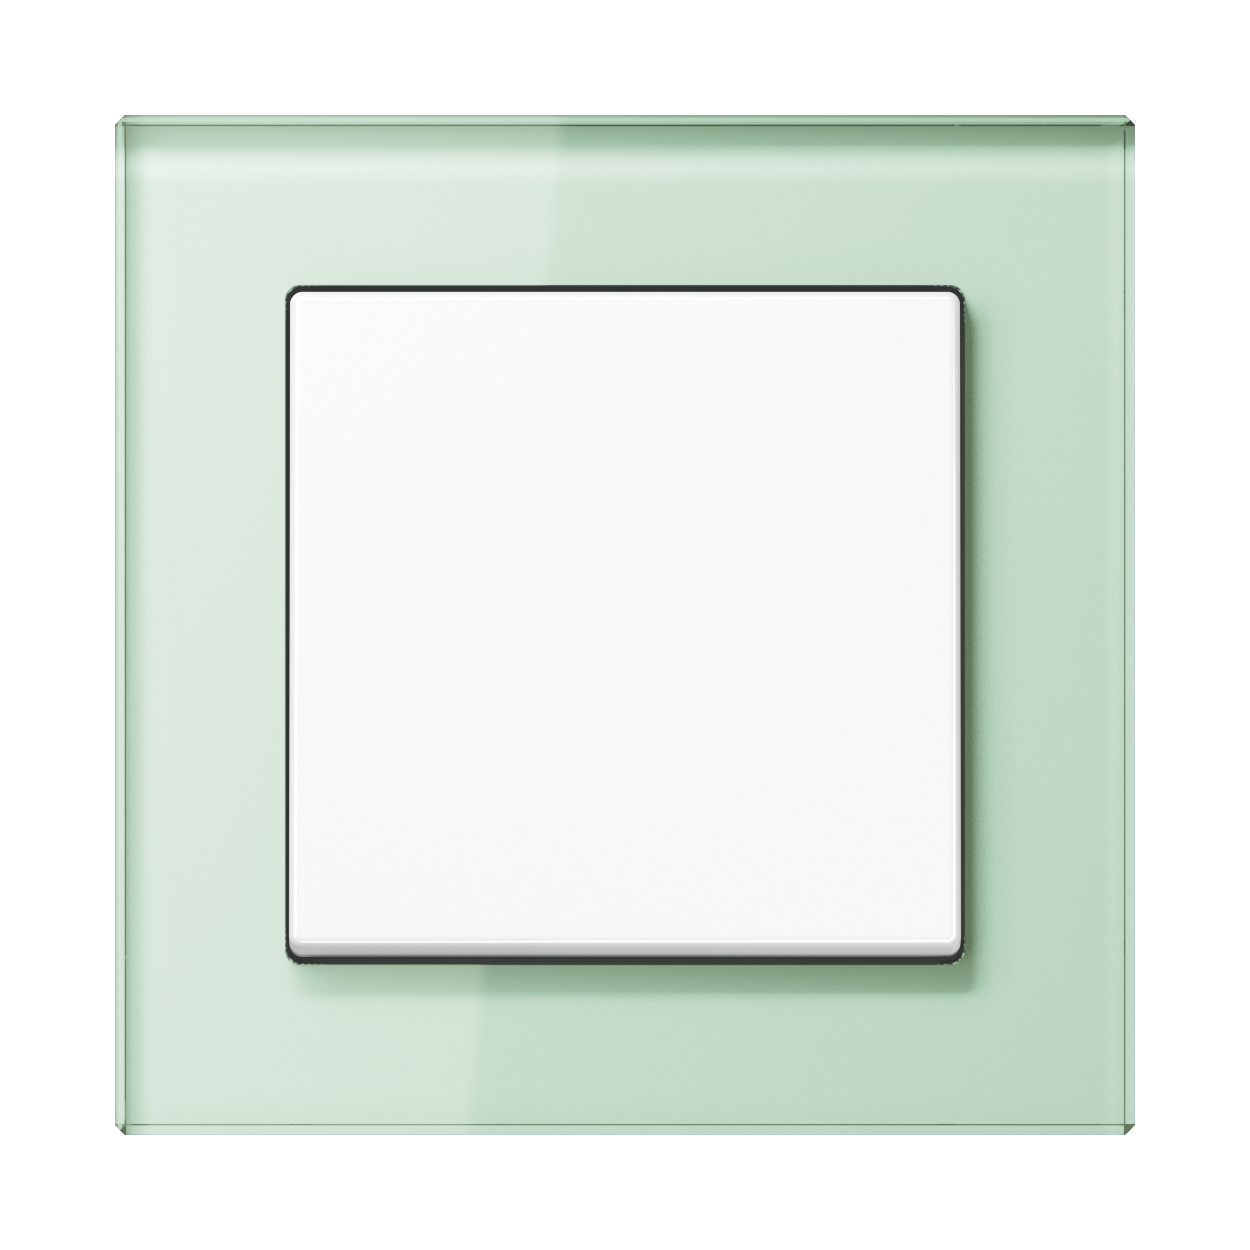 JUNG_AC_GL_soft_white_switch